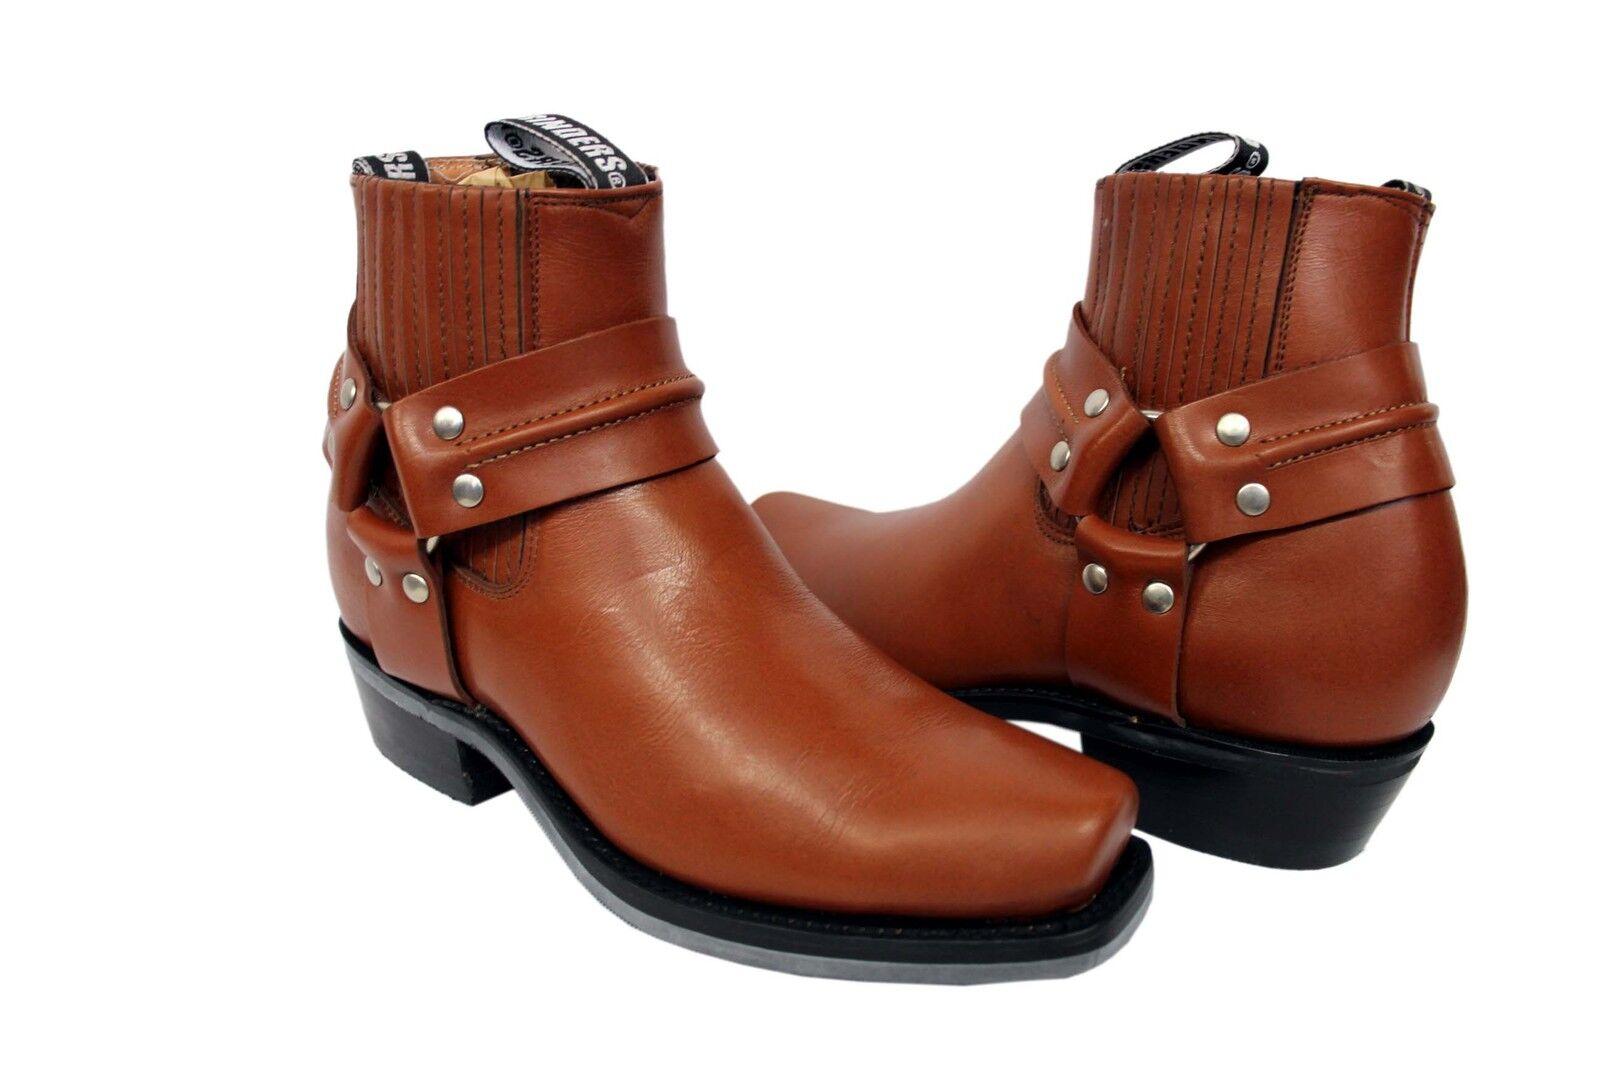 Grinders Renegade lo tan unisexe bottes de cuir cowboy western western western motard cheville bottes   Stocker    D'ornement  cd173a